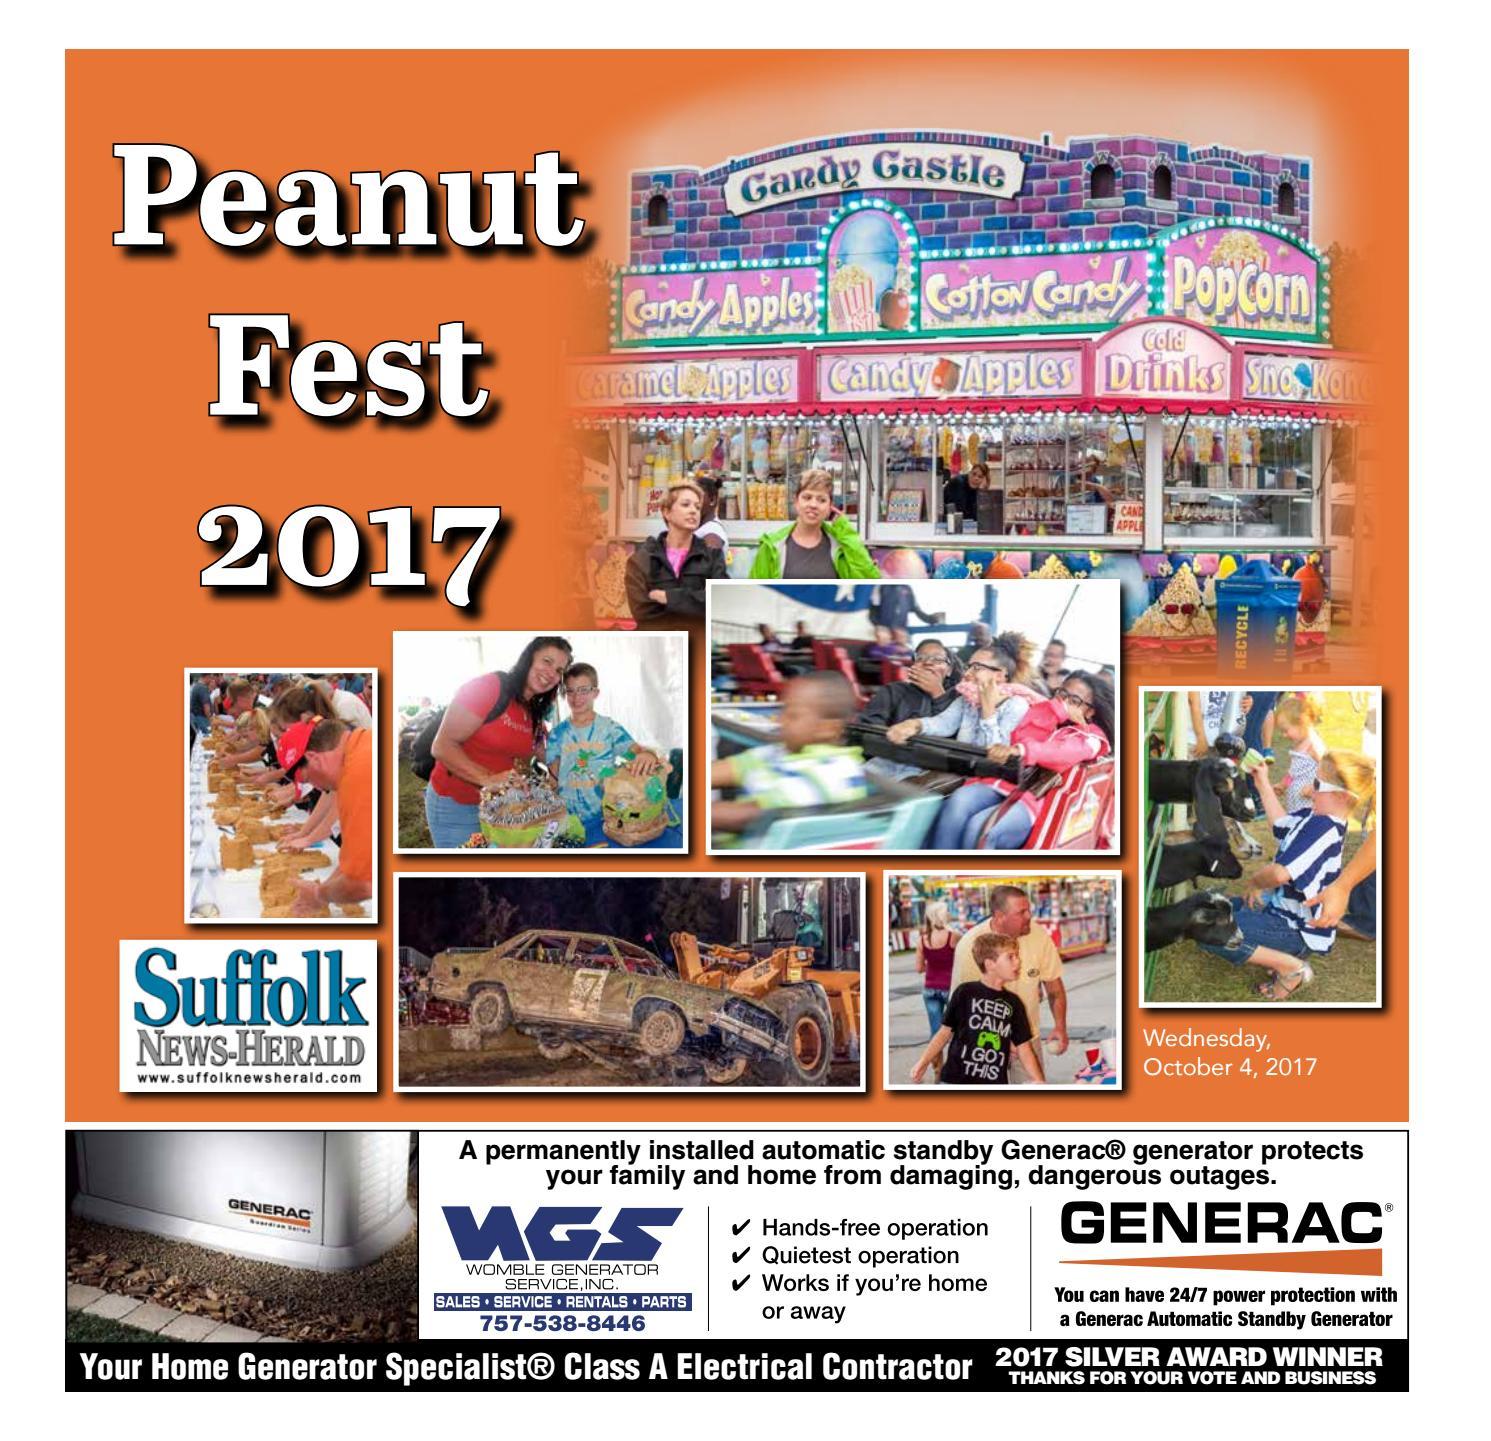 Peanut Fest 2017 by Suffolk News Herald issuu